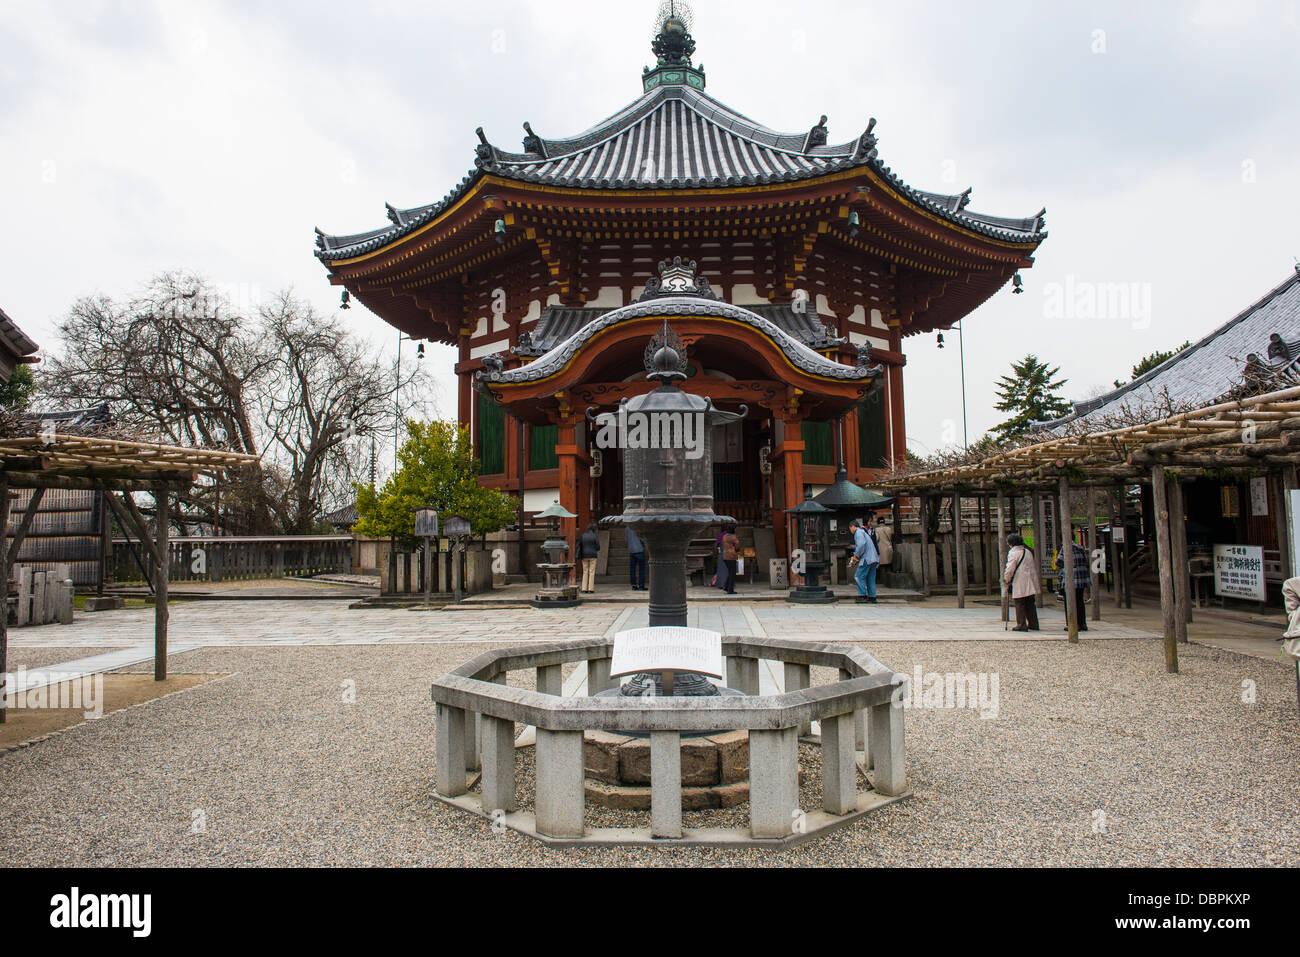 Nan'endo (Southern Octagonal Hall), Kofukuji Temple, UNESCO World Heritage Site, Nara, Kansai, Japan, Asia - Stock Image